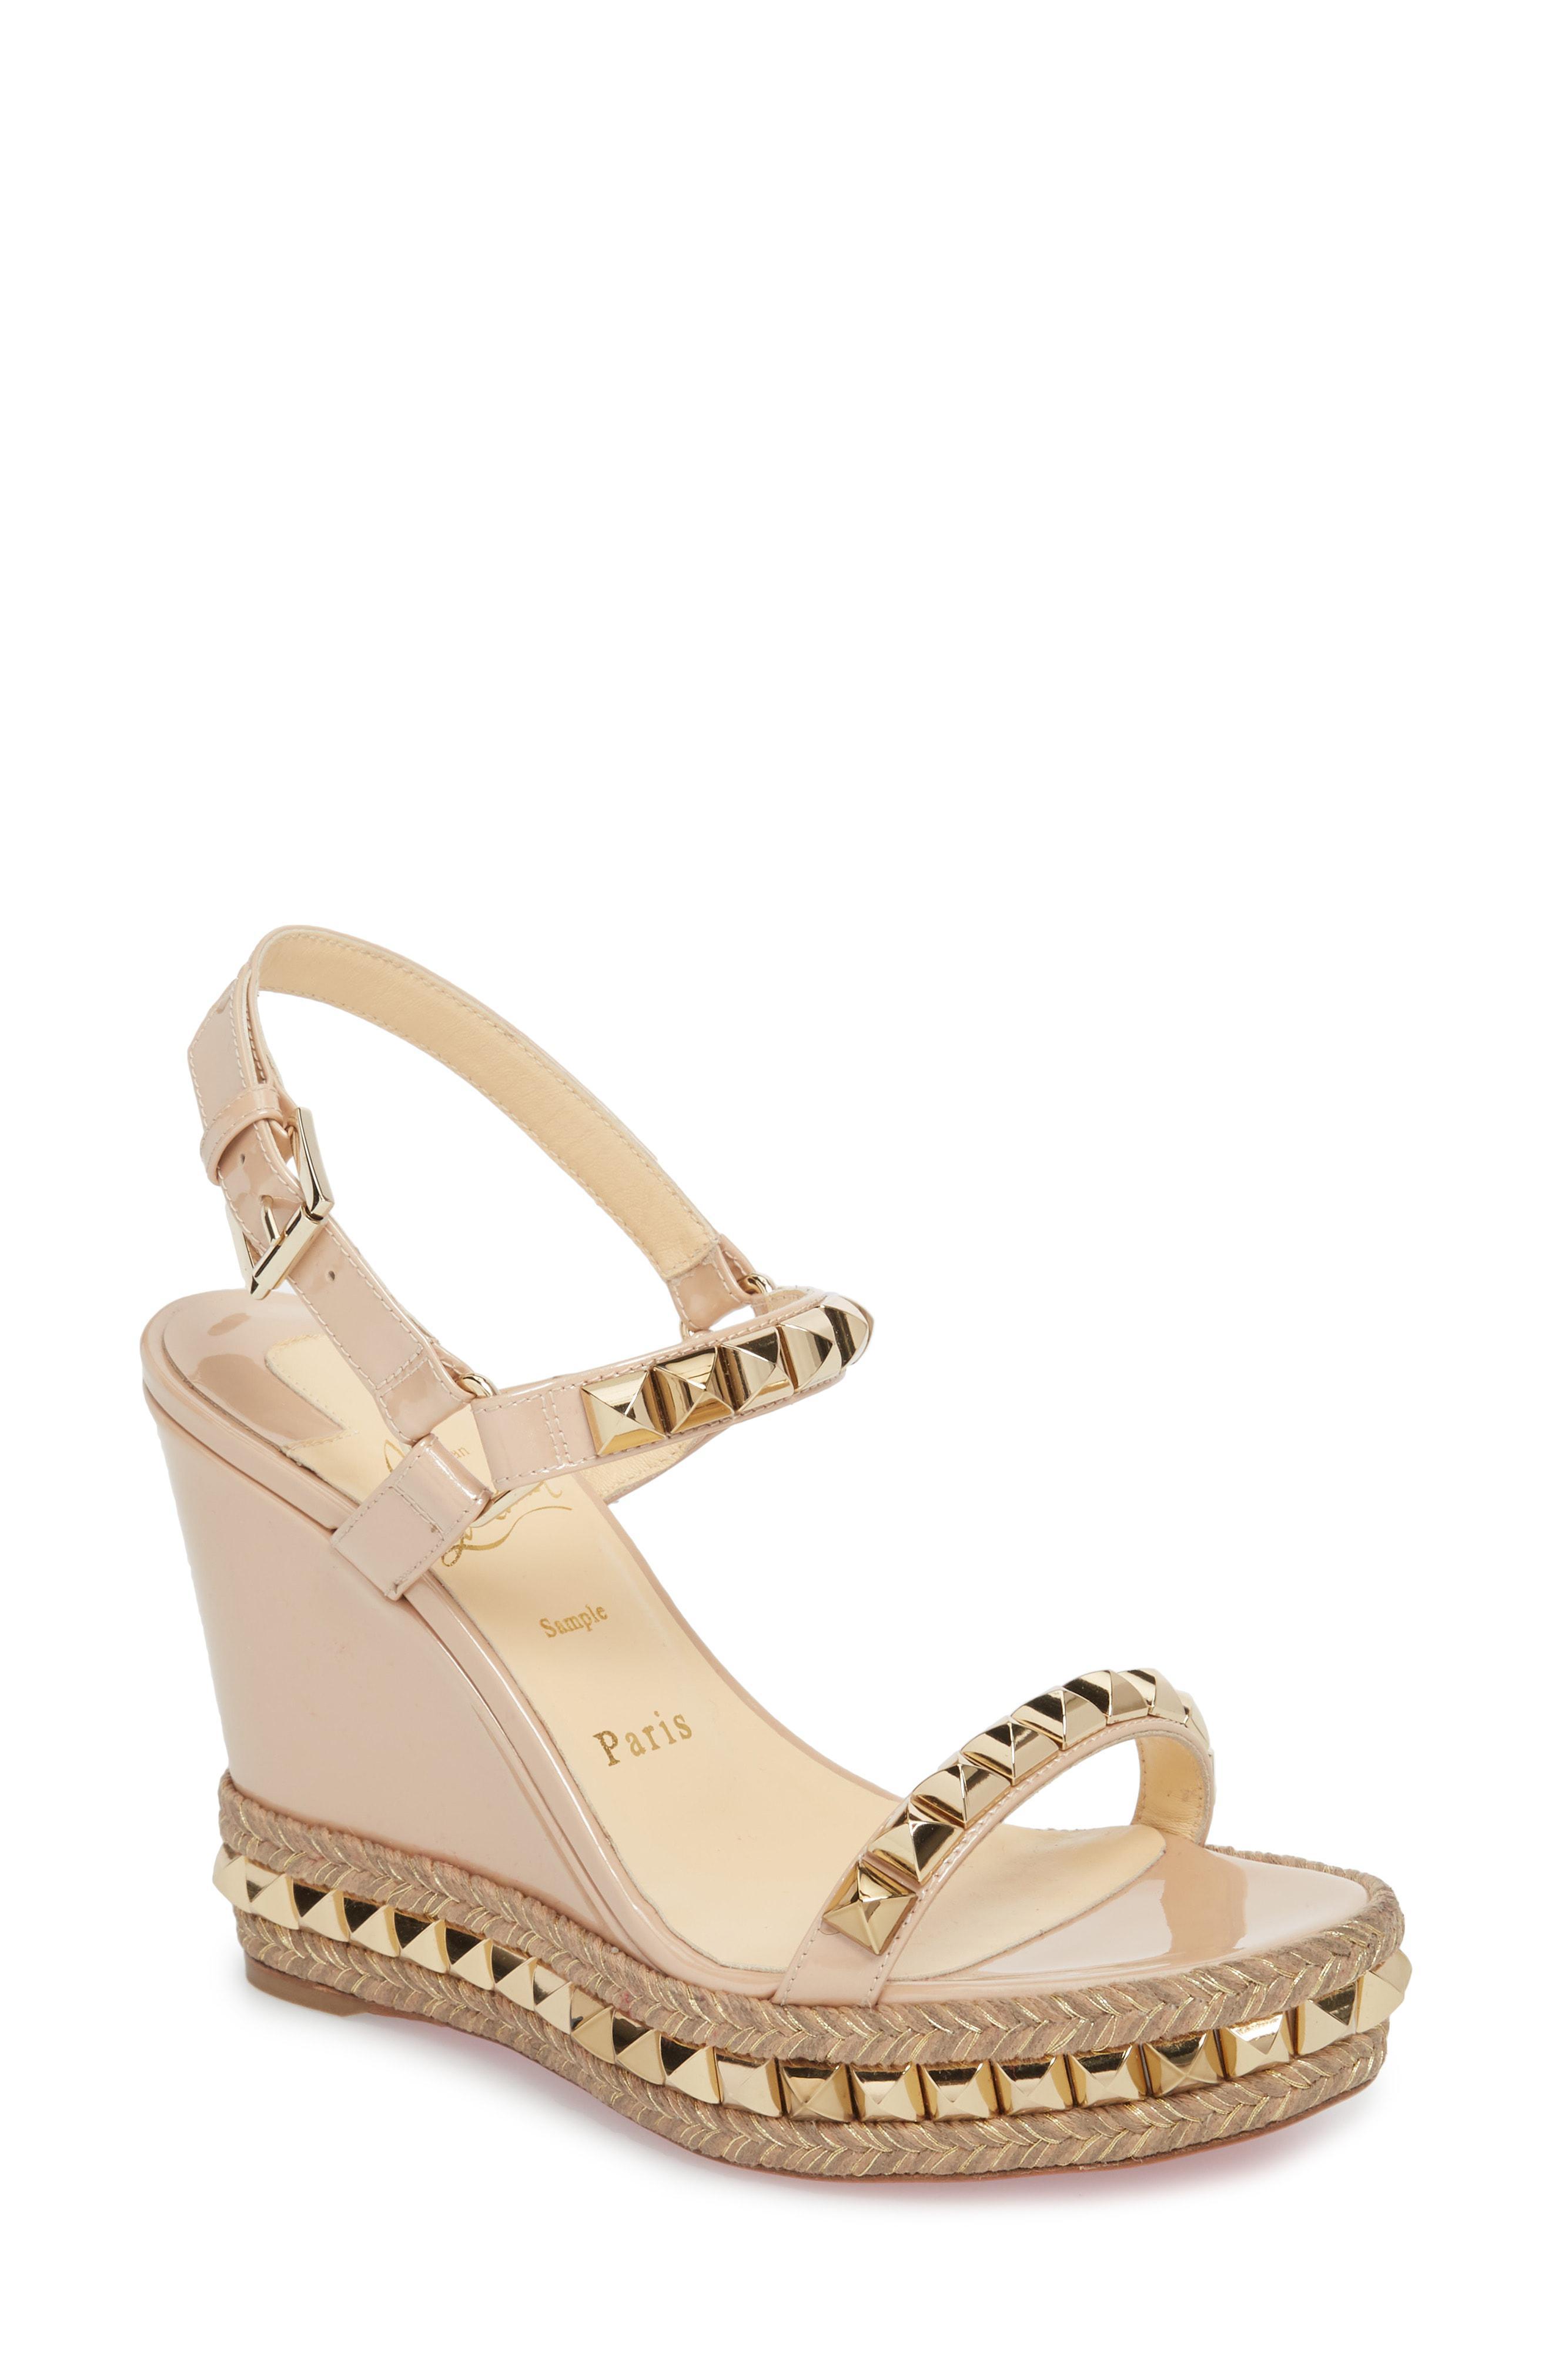 792e5e54c08 Lyst - Christian Louboutin Cataclou Espadrille Wedge Sandal in Metallic